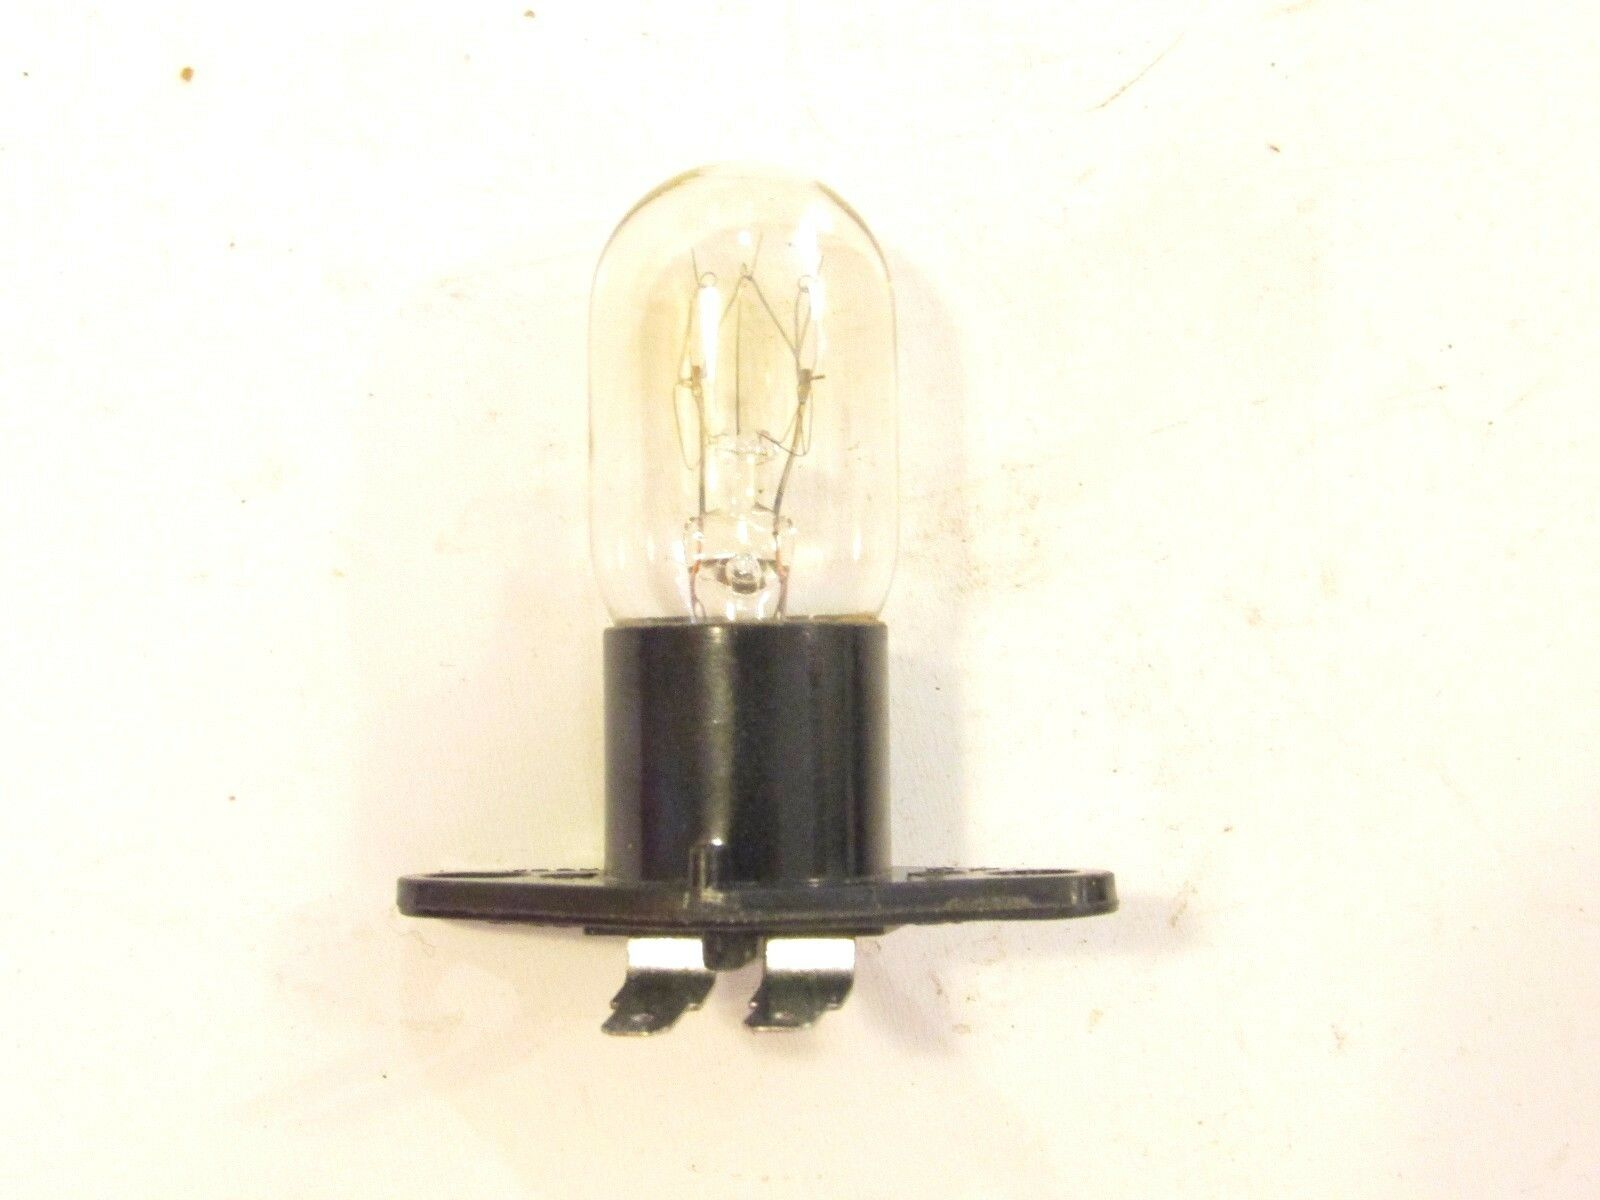 angle switch motion storage to pir basement ac automatic pantry light for room adapter lamp torchstar sensor lighting garage holder detection led socket